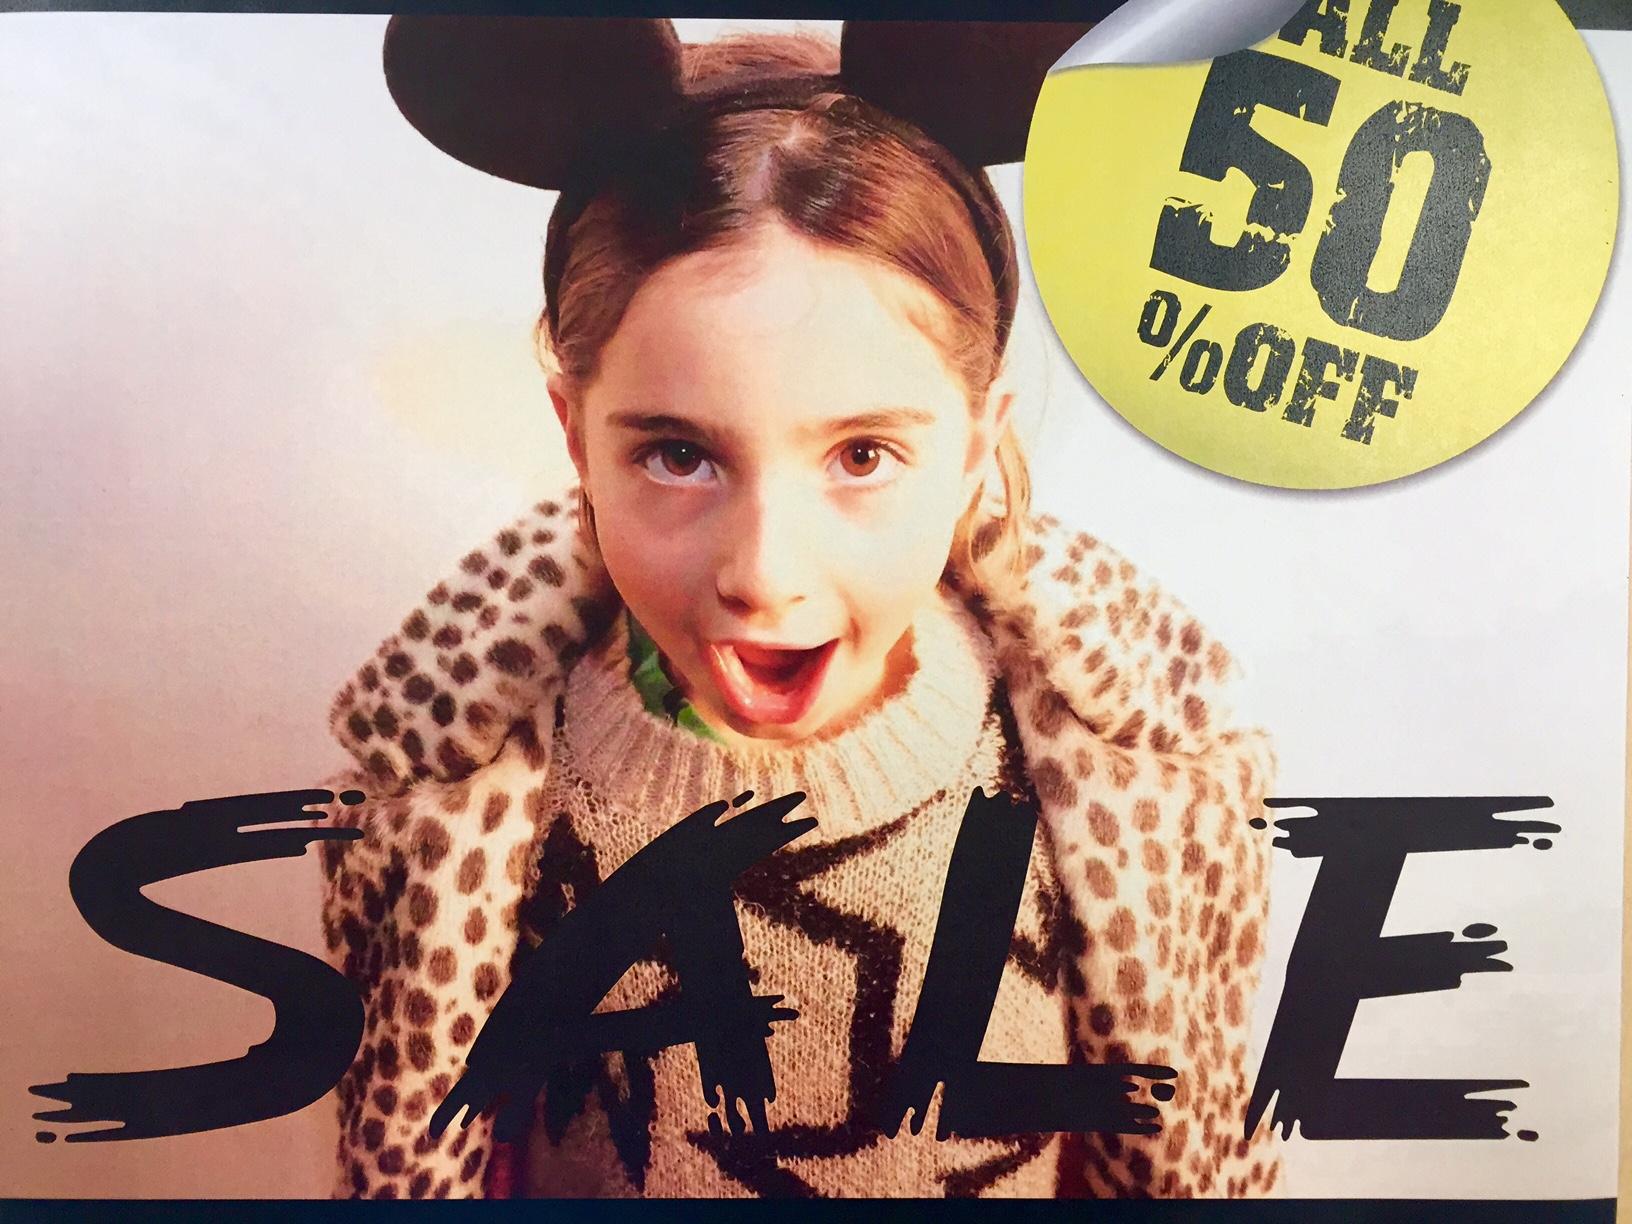 【BOBO CHOSES 50%OFFセール!】 ボボショーズ 店舗 大阪「子供服のMonette/モネット」】